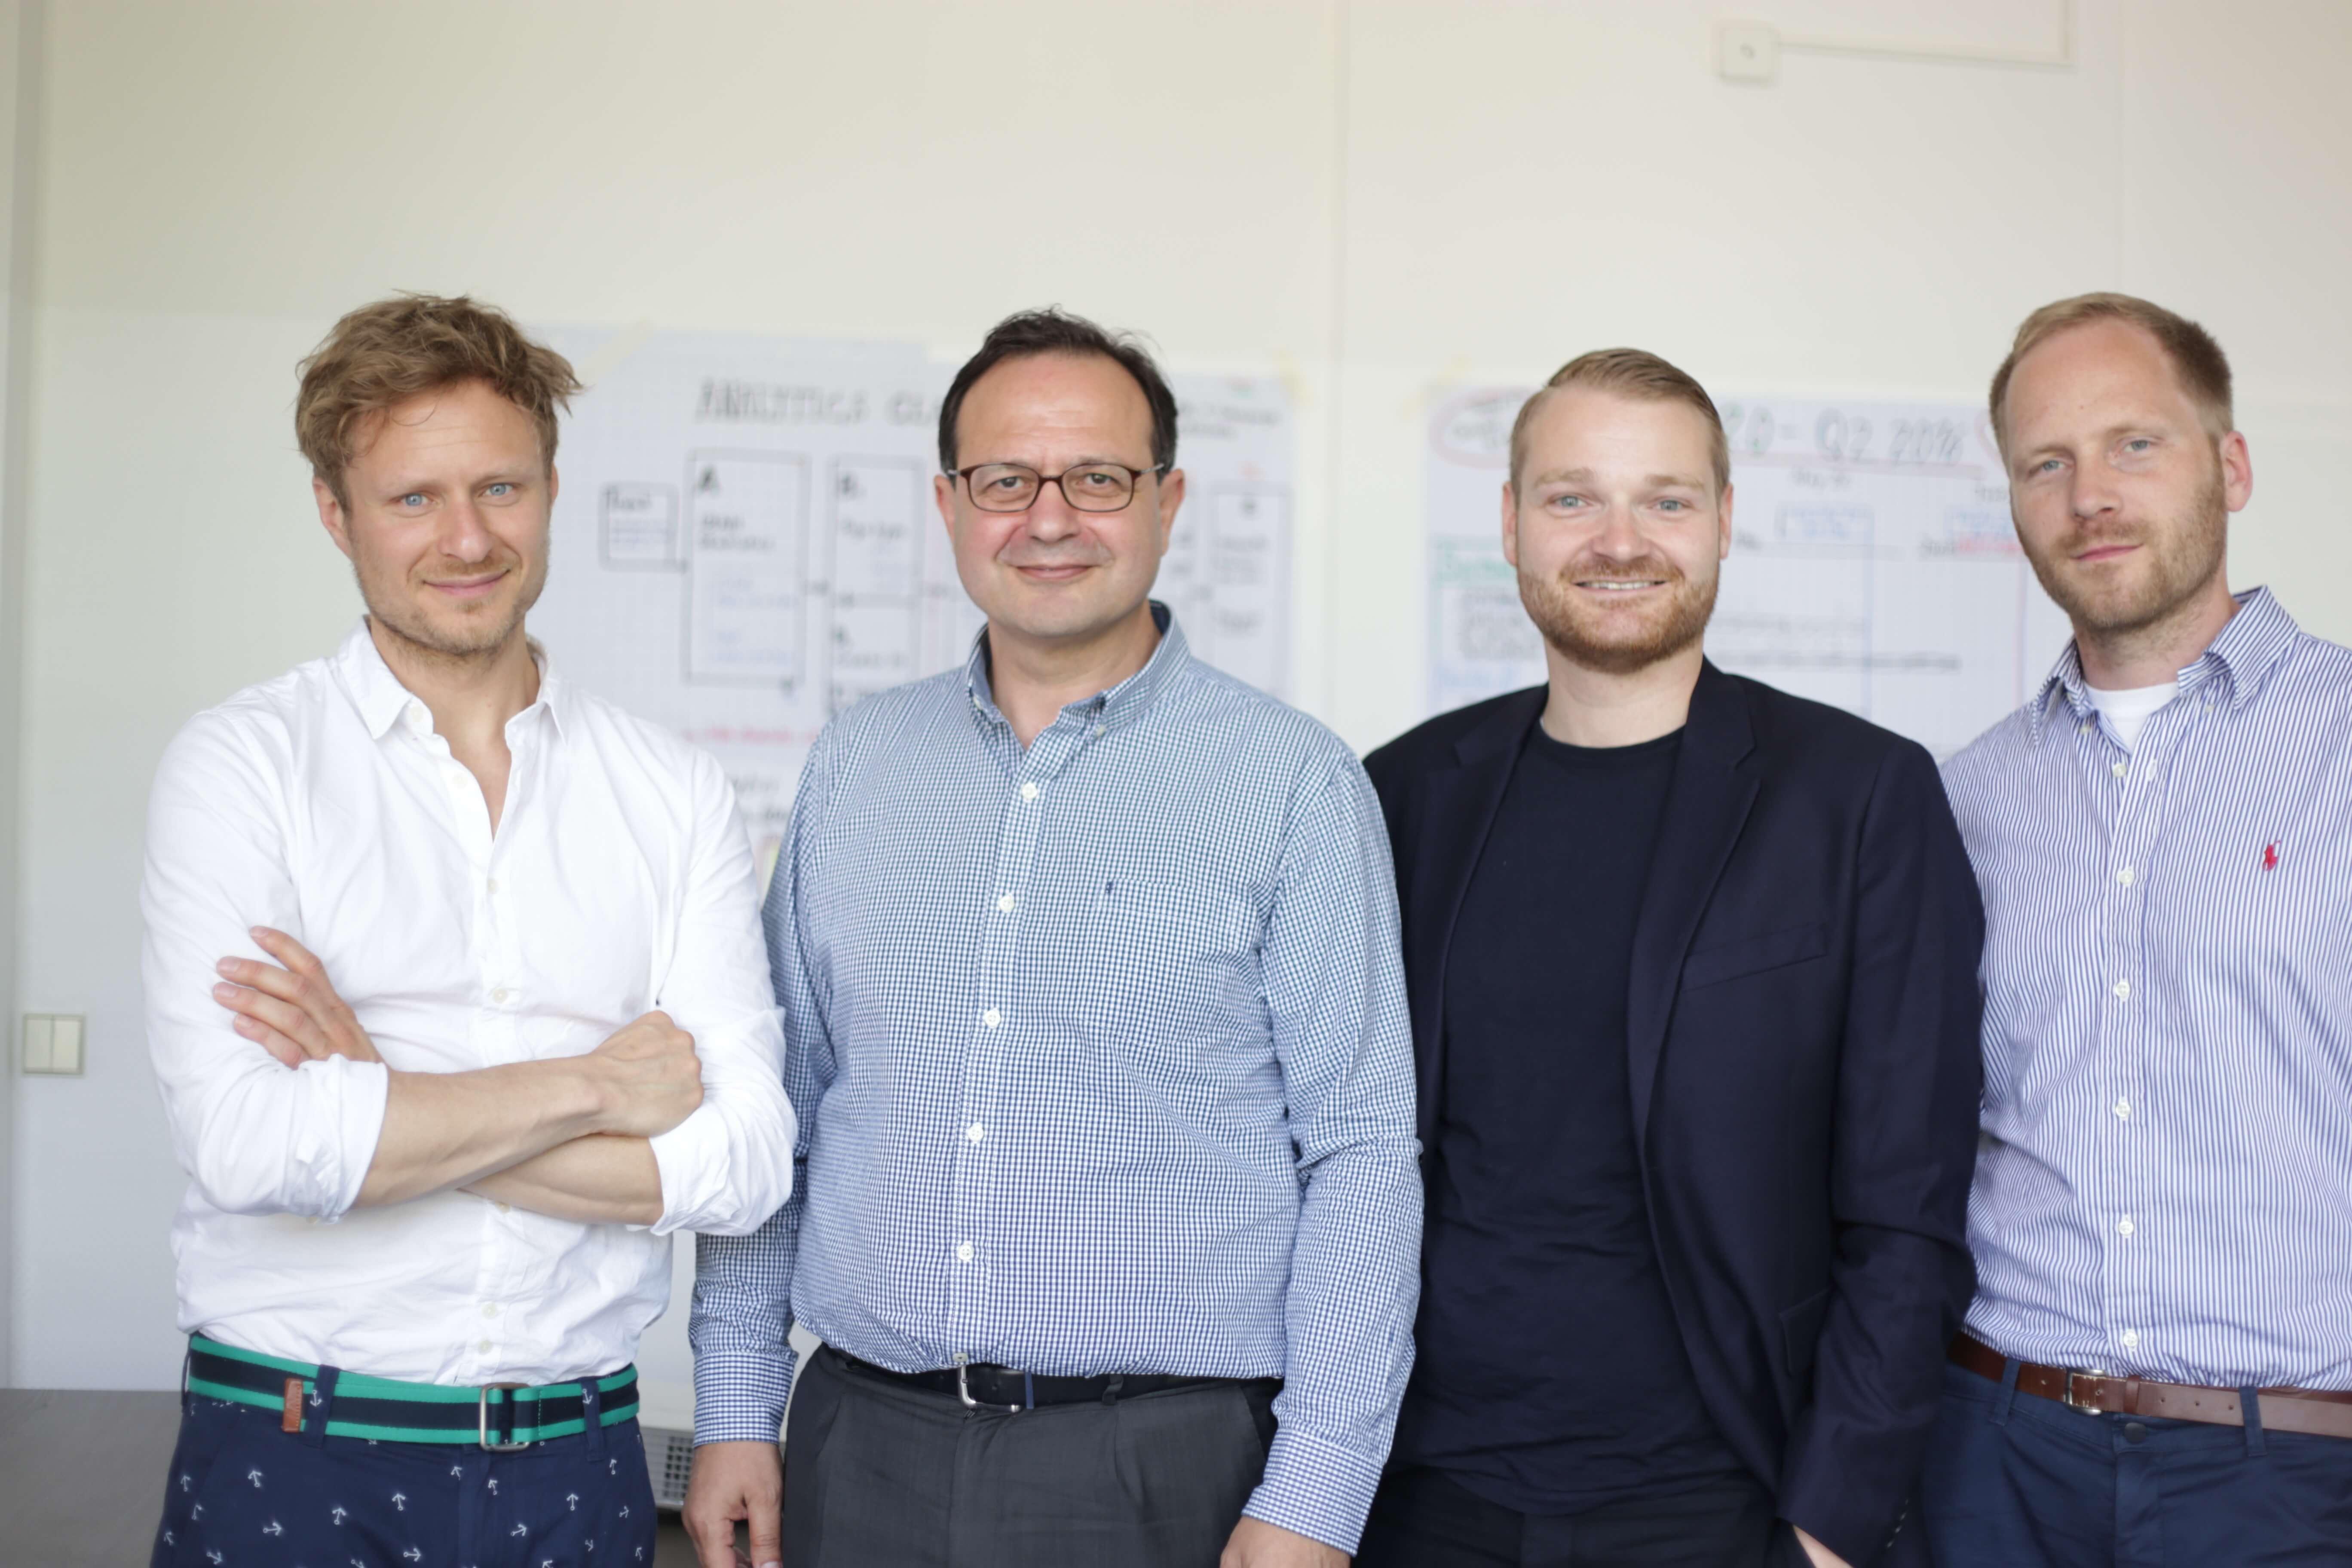 Gründerteam-Andreas-Bermig-Gamal-Moukabary-Josef-Korte-Jan-Ortmann.jpg